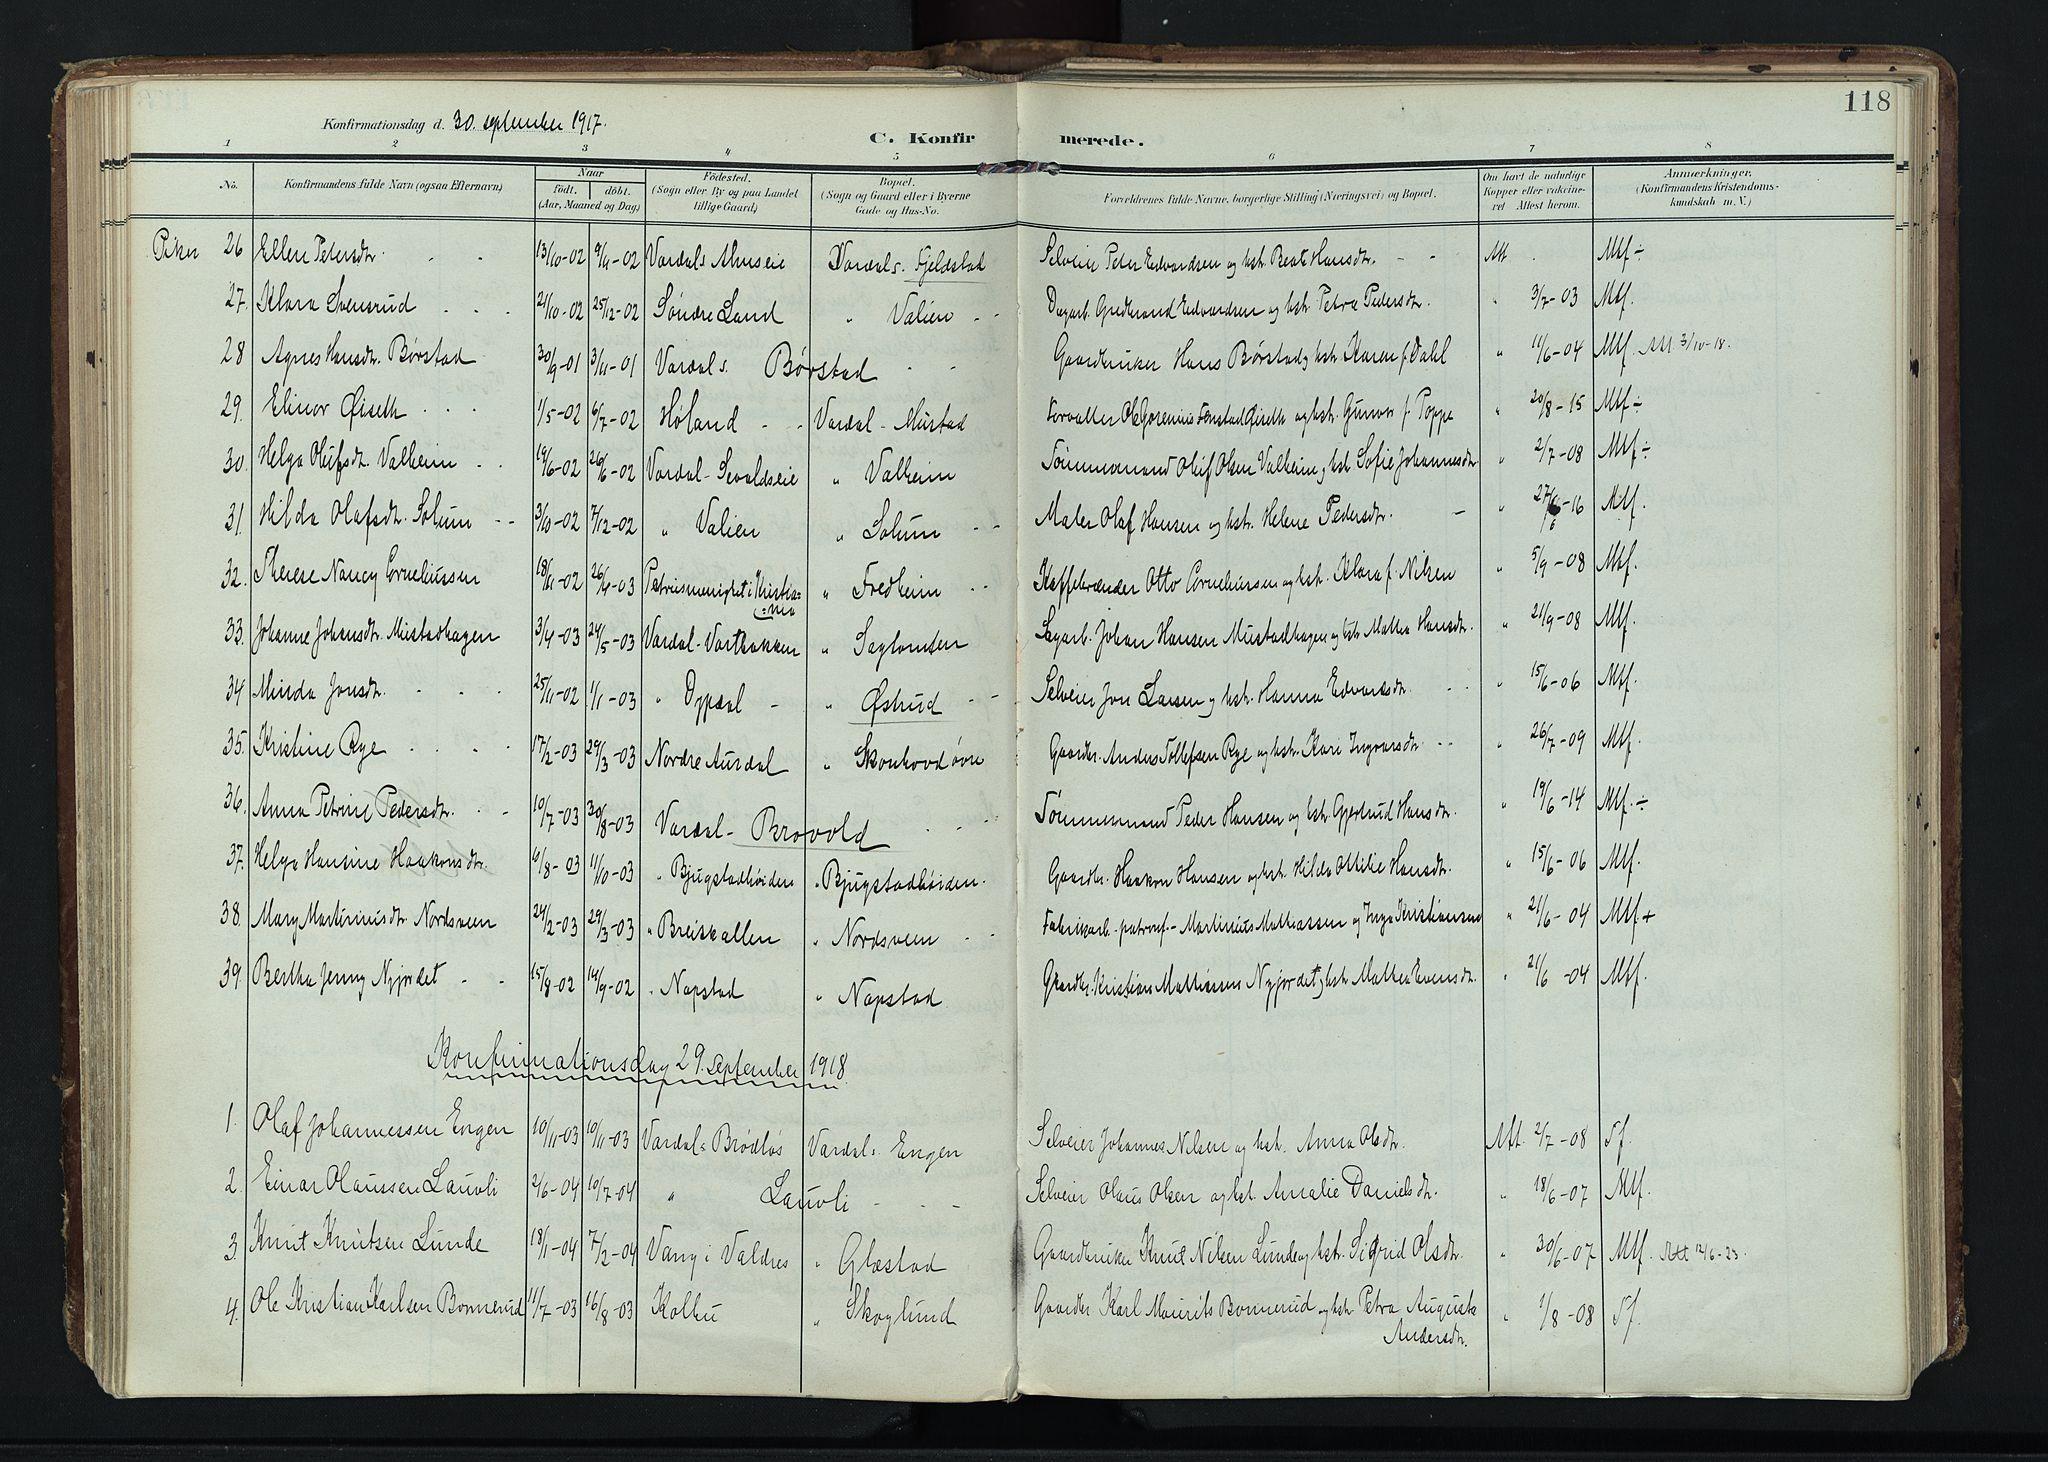 SAH, Vardal prestekontor, H/Ha/Haa/L0020: Ministerialbok nr. 20, 1907-1921, s. 118